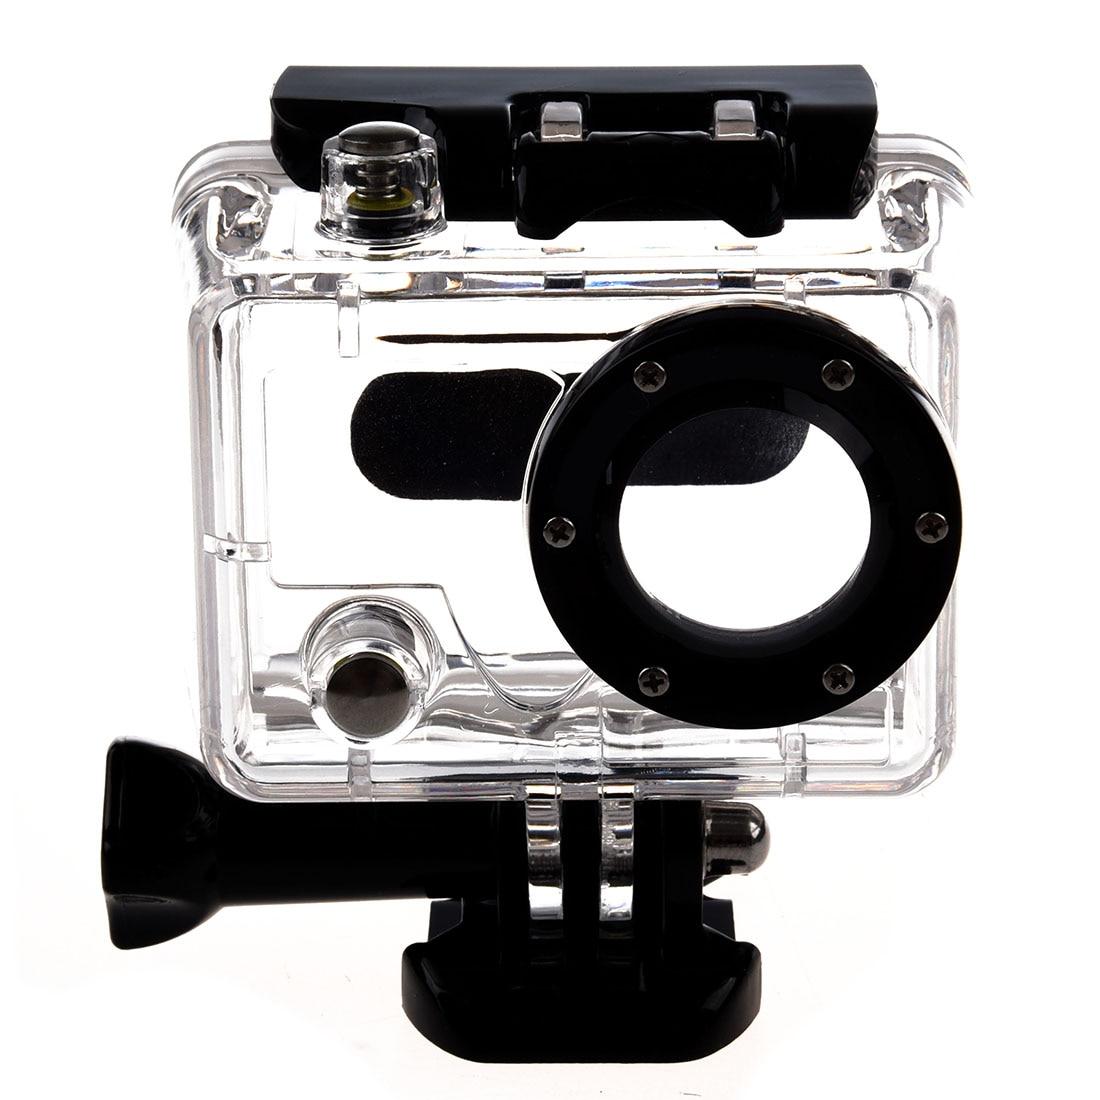 Waterproof Dive Housing Case Skeleton With Lens For Gopro Hero 2 Camera